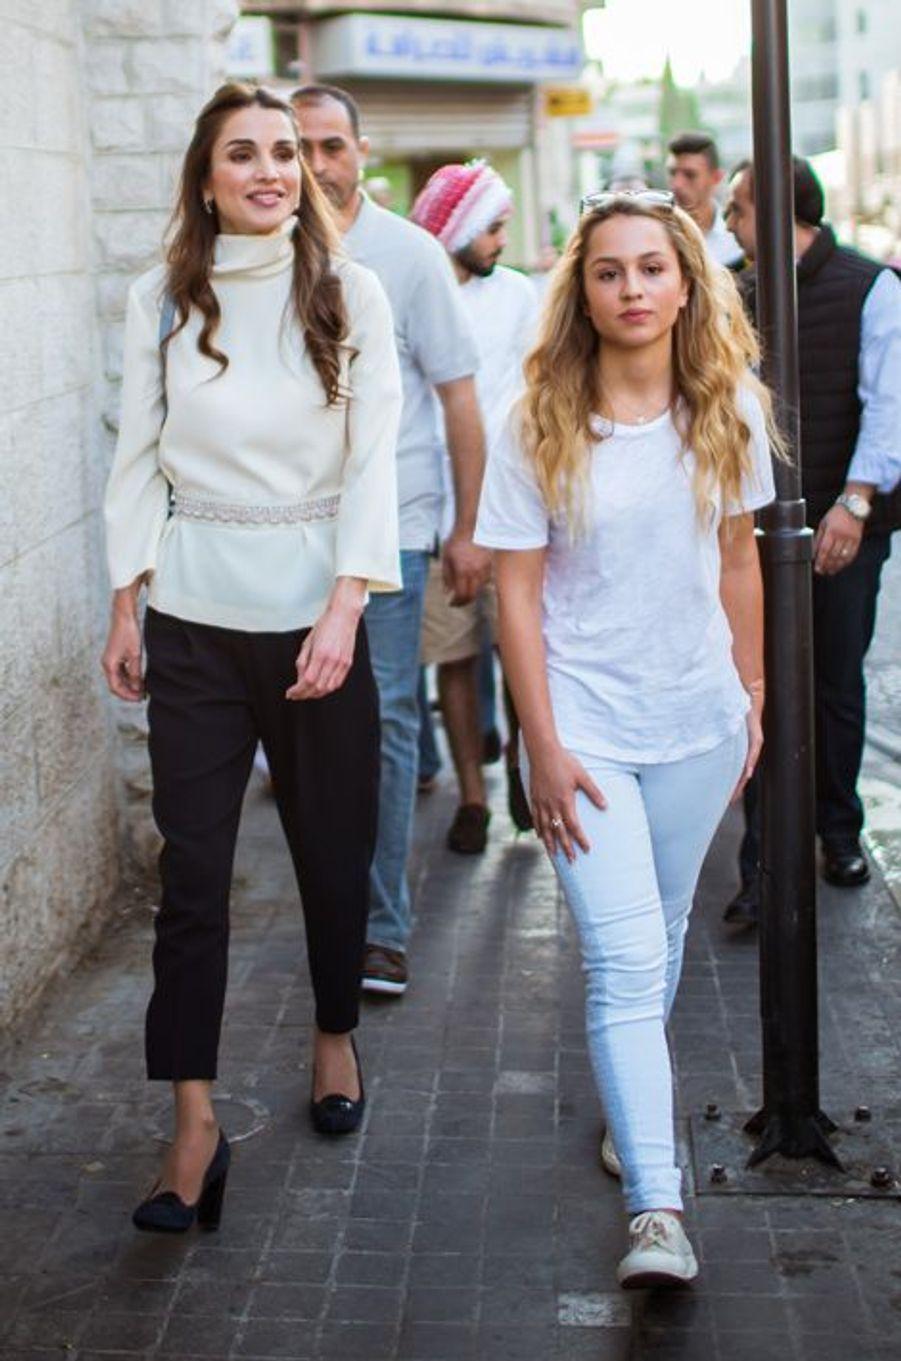 La reine Rania de Jordanie et la princesse Iman, le 16 août 2015